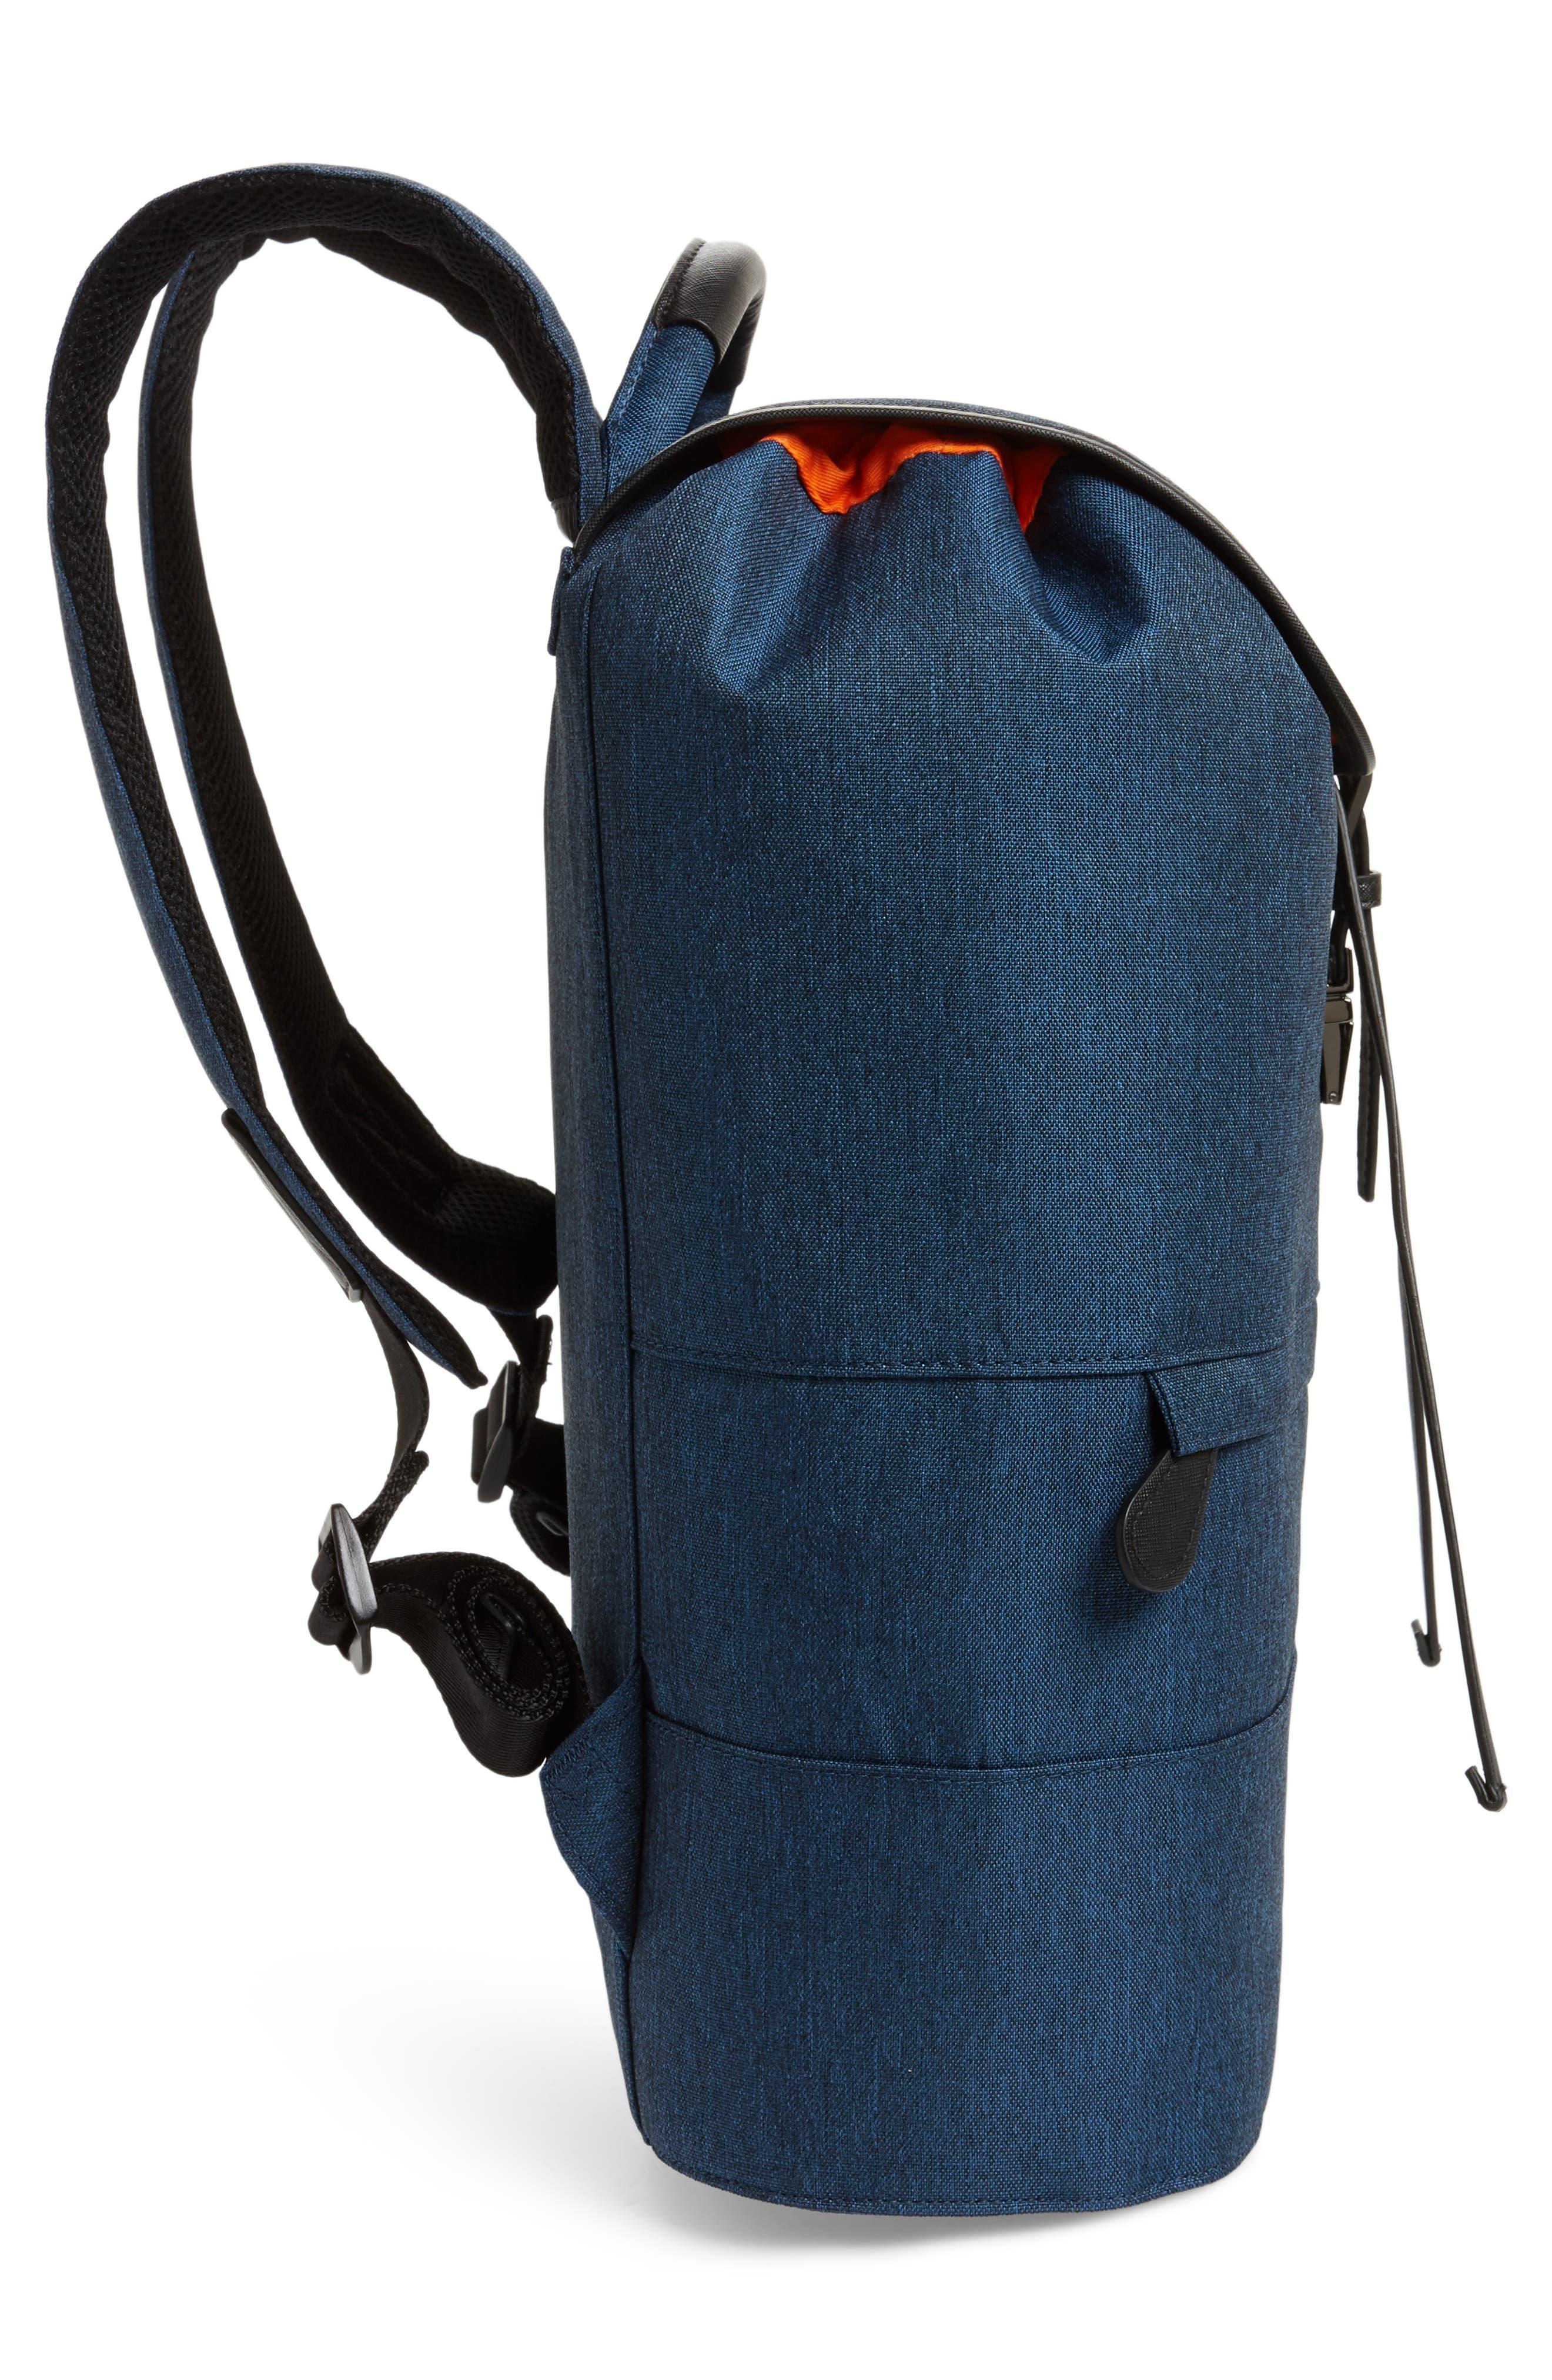 Rayman Backpack,                             Alternate thumbnail 5, color,                             Blue